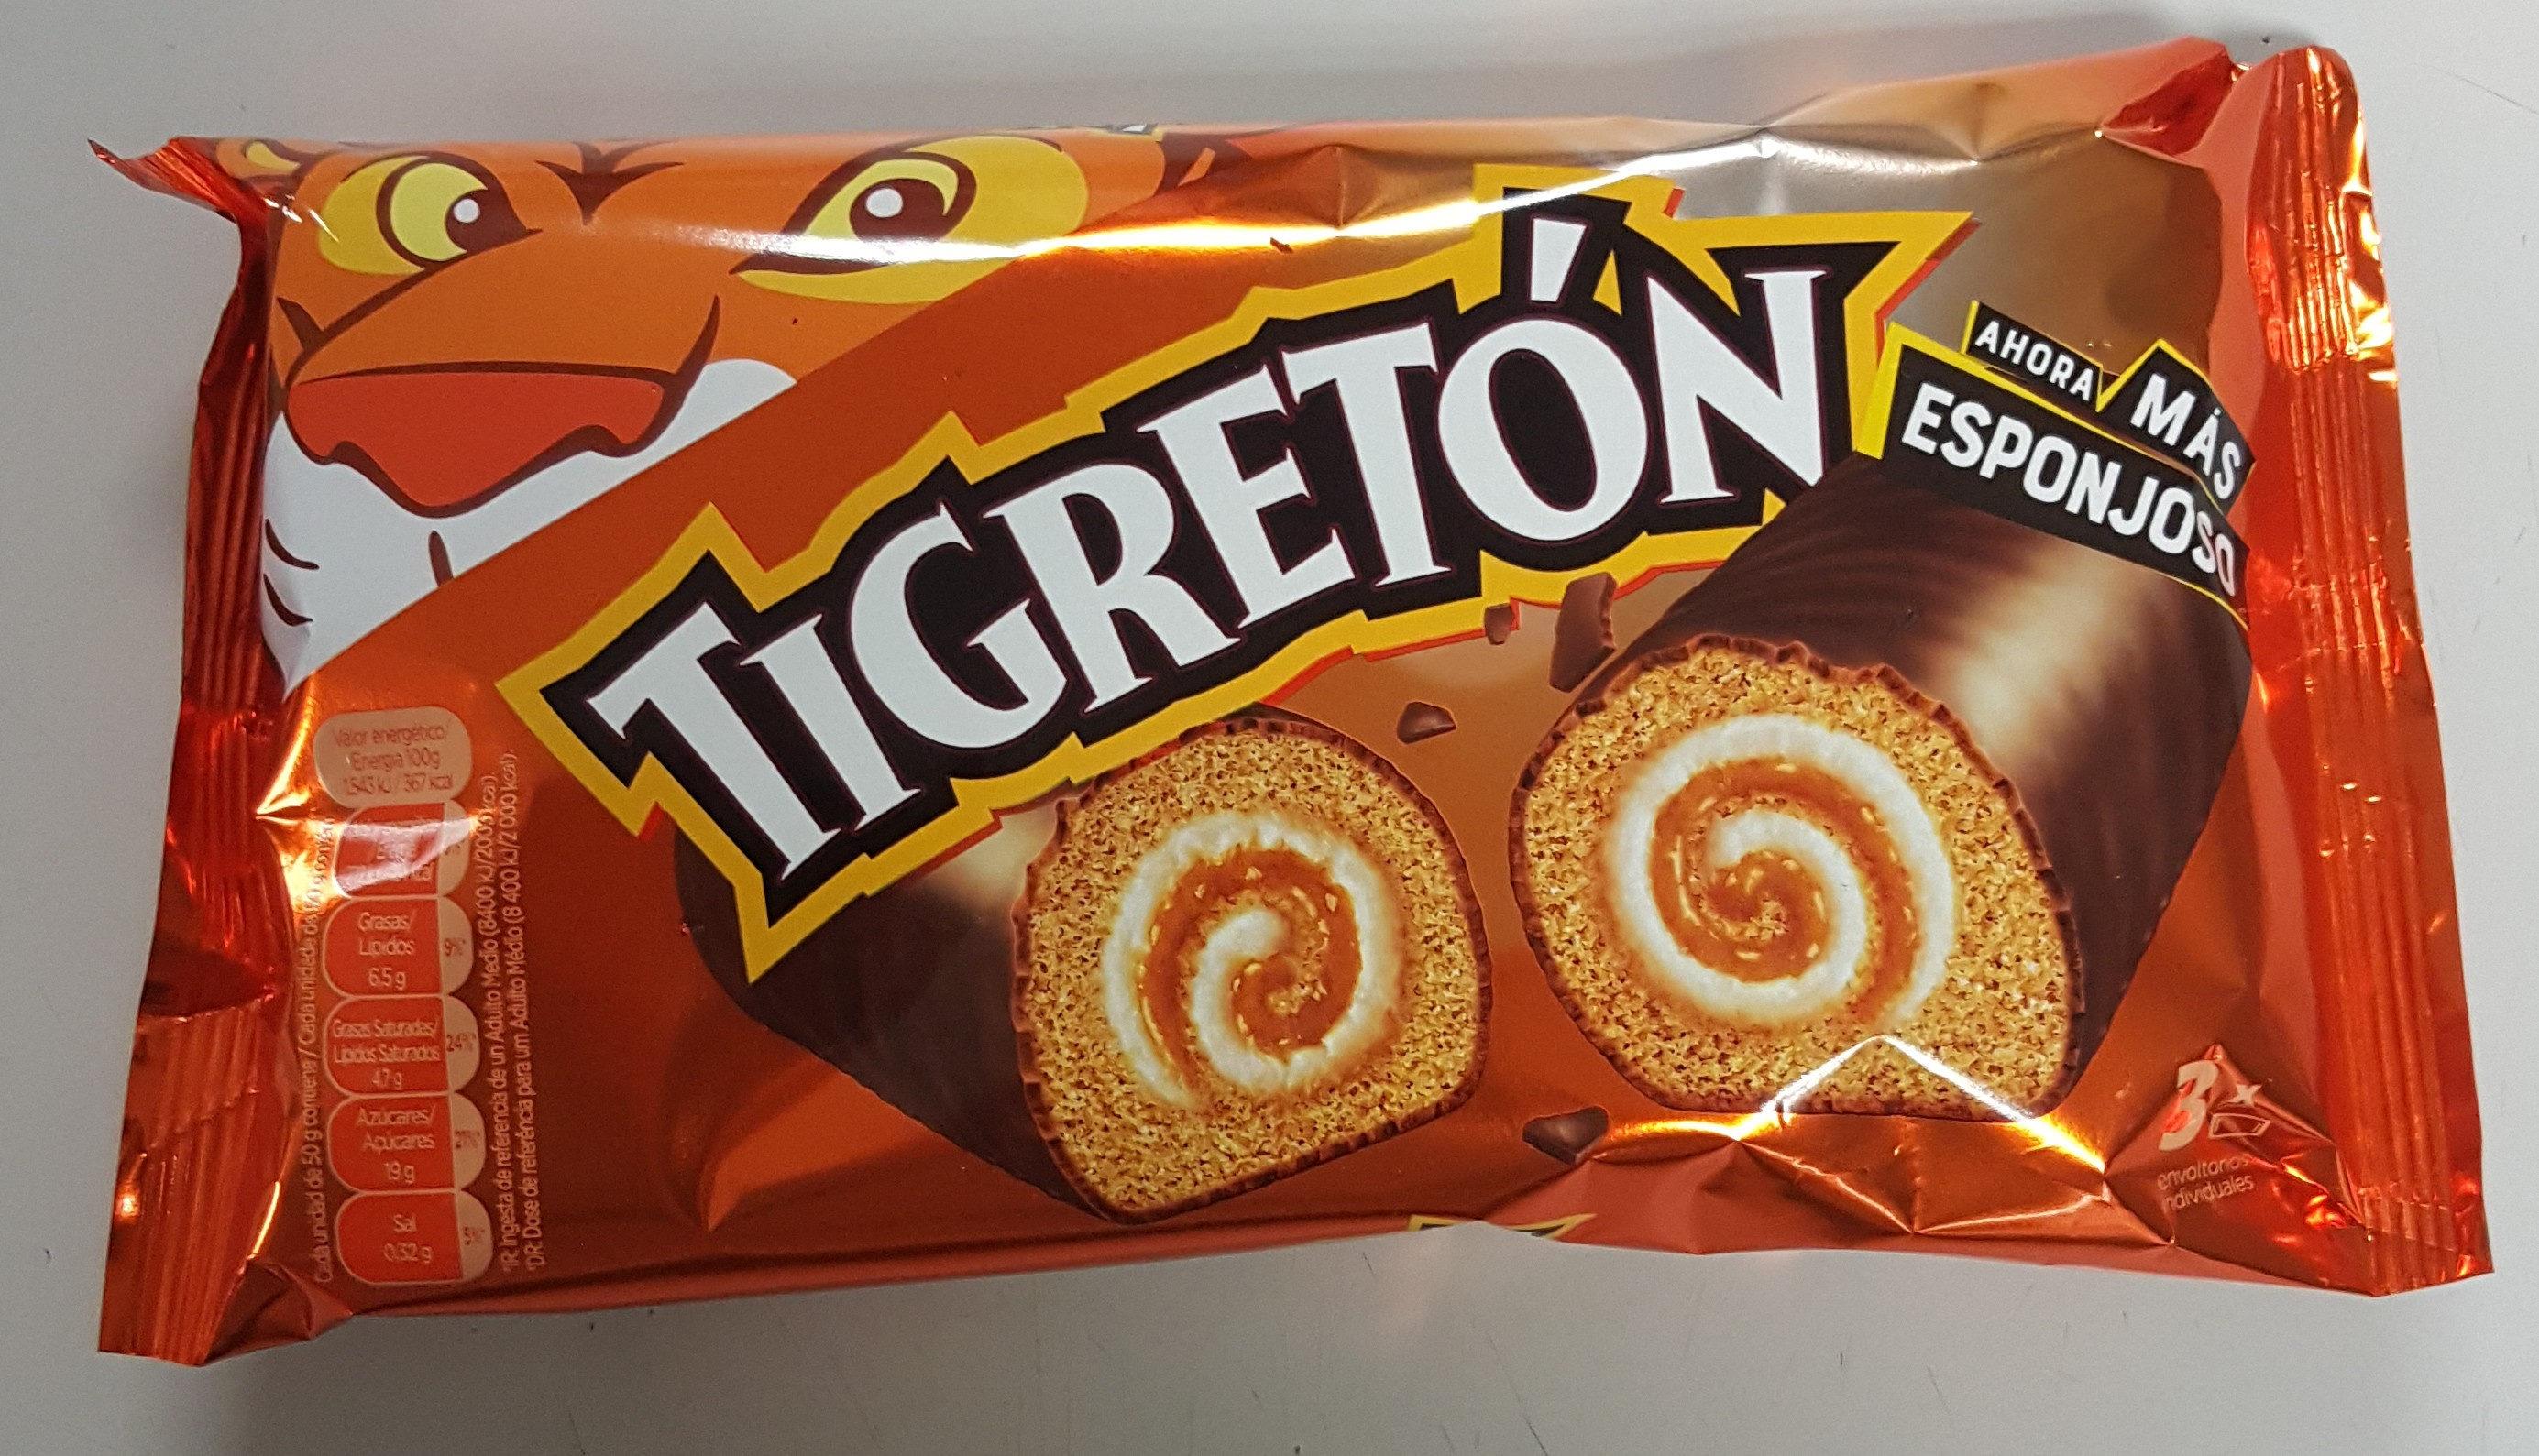 Tigretón - Product